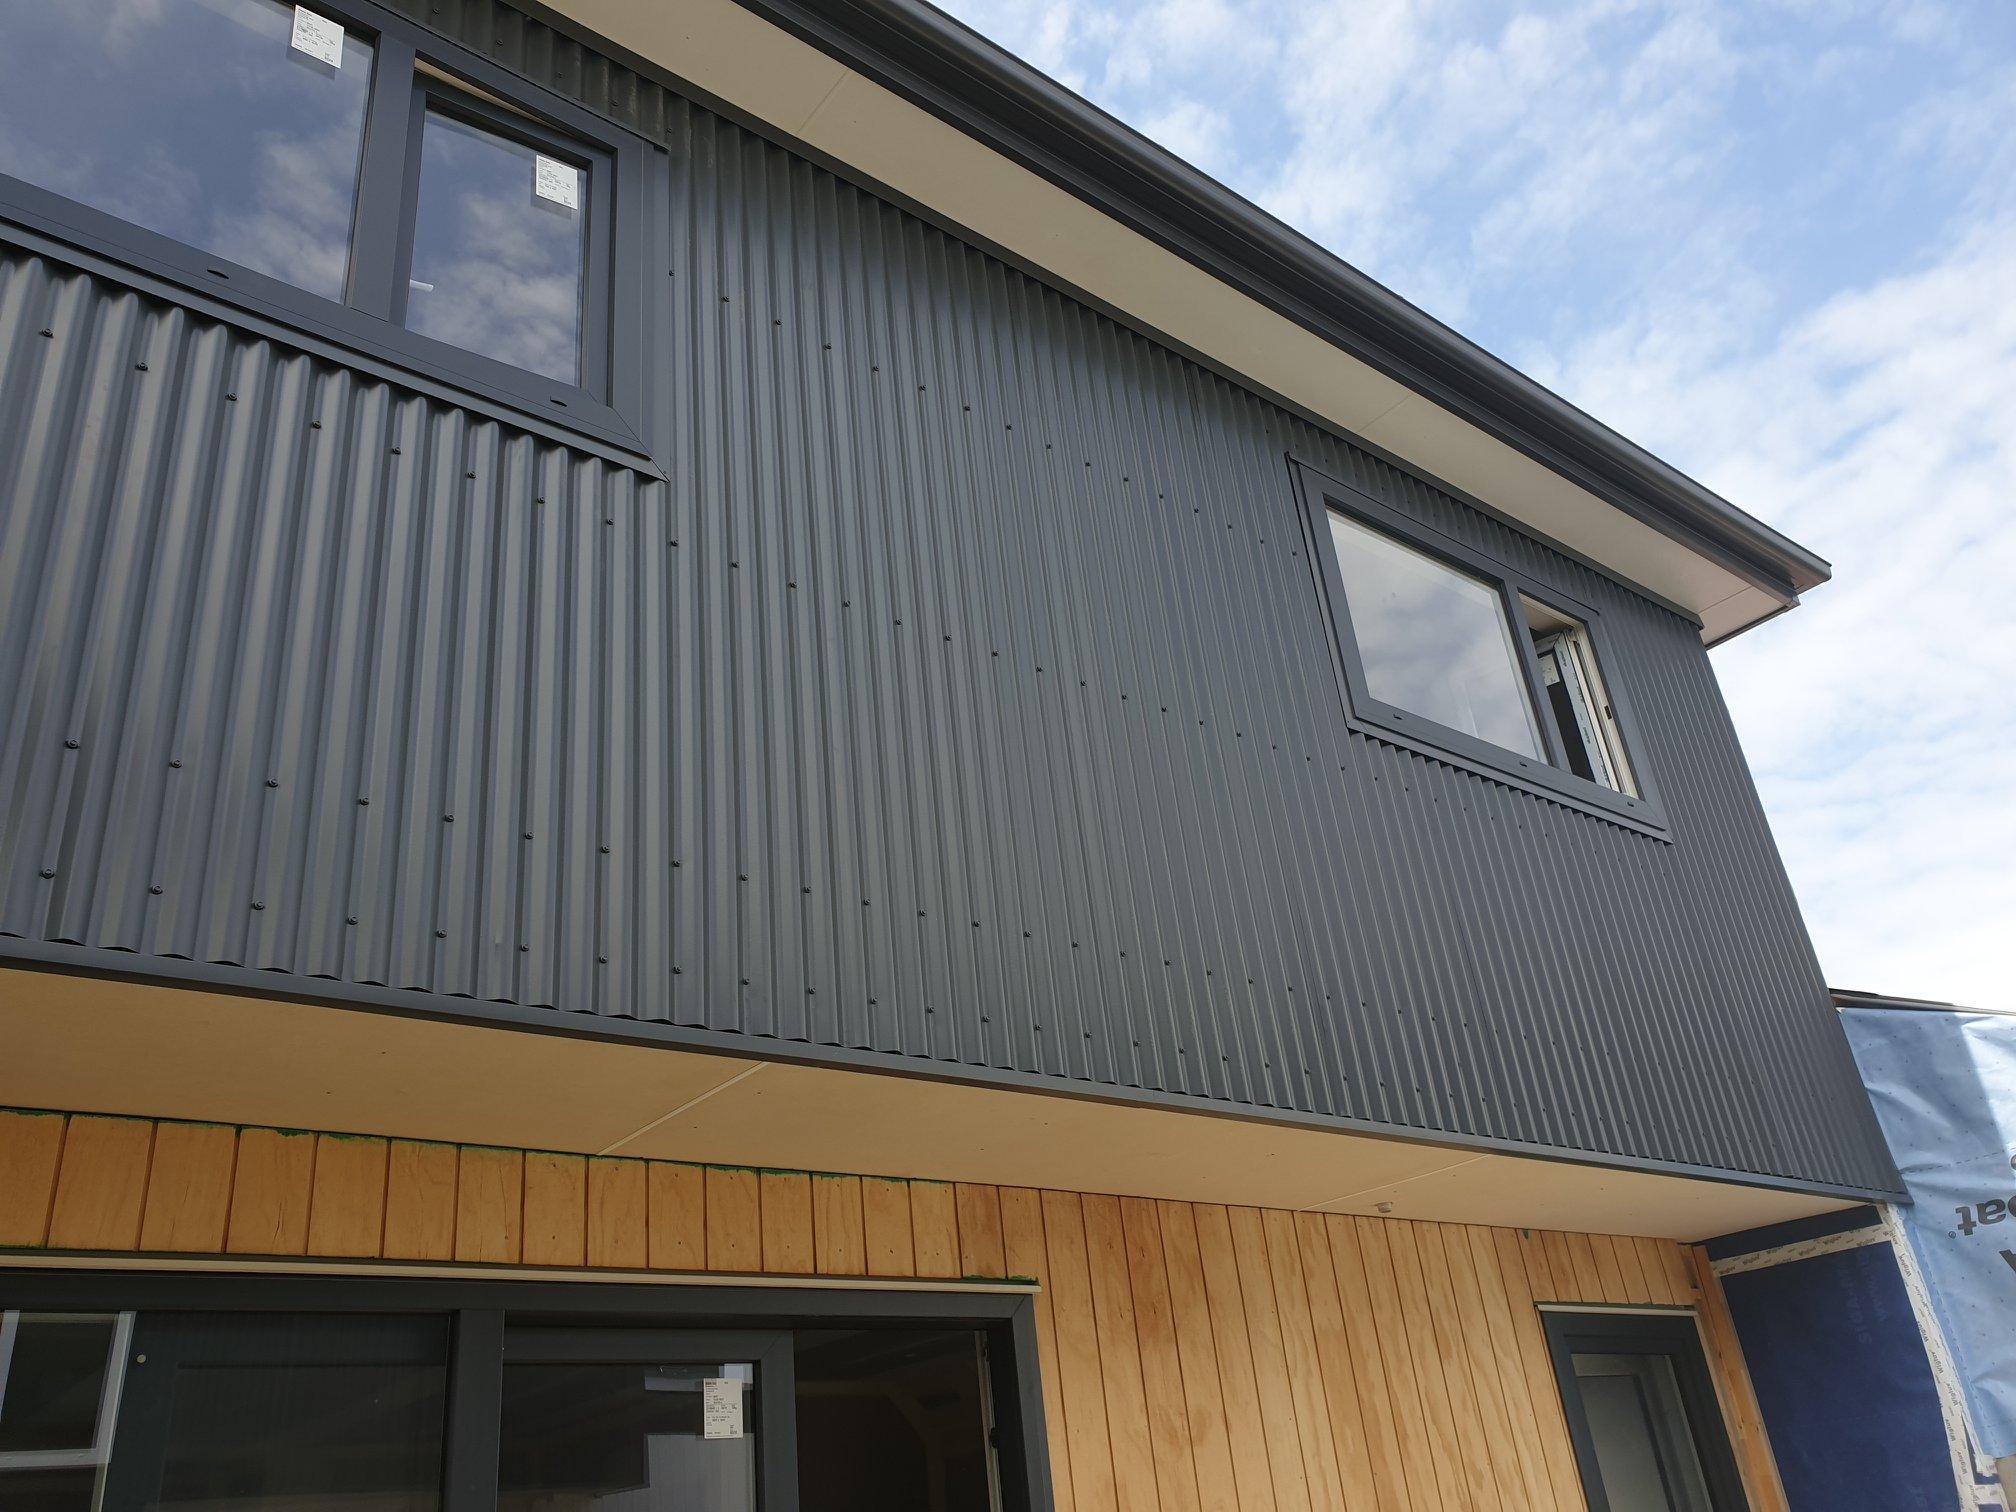 Addington apartments Grey Friars corrugated iron wall cladding